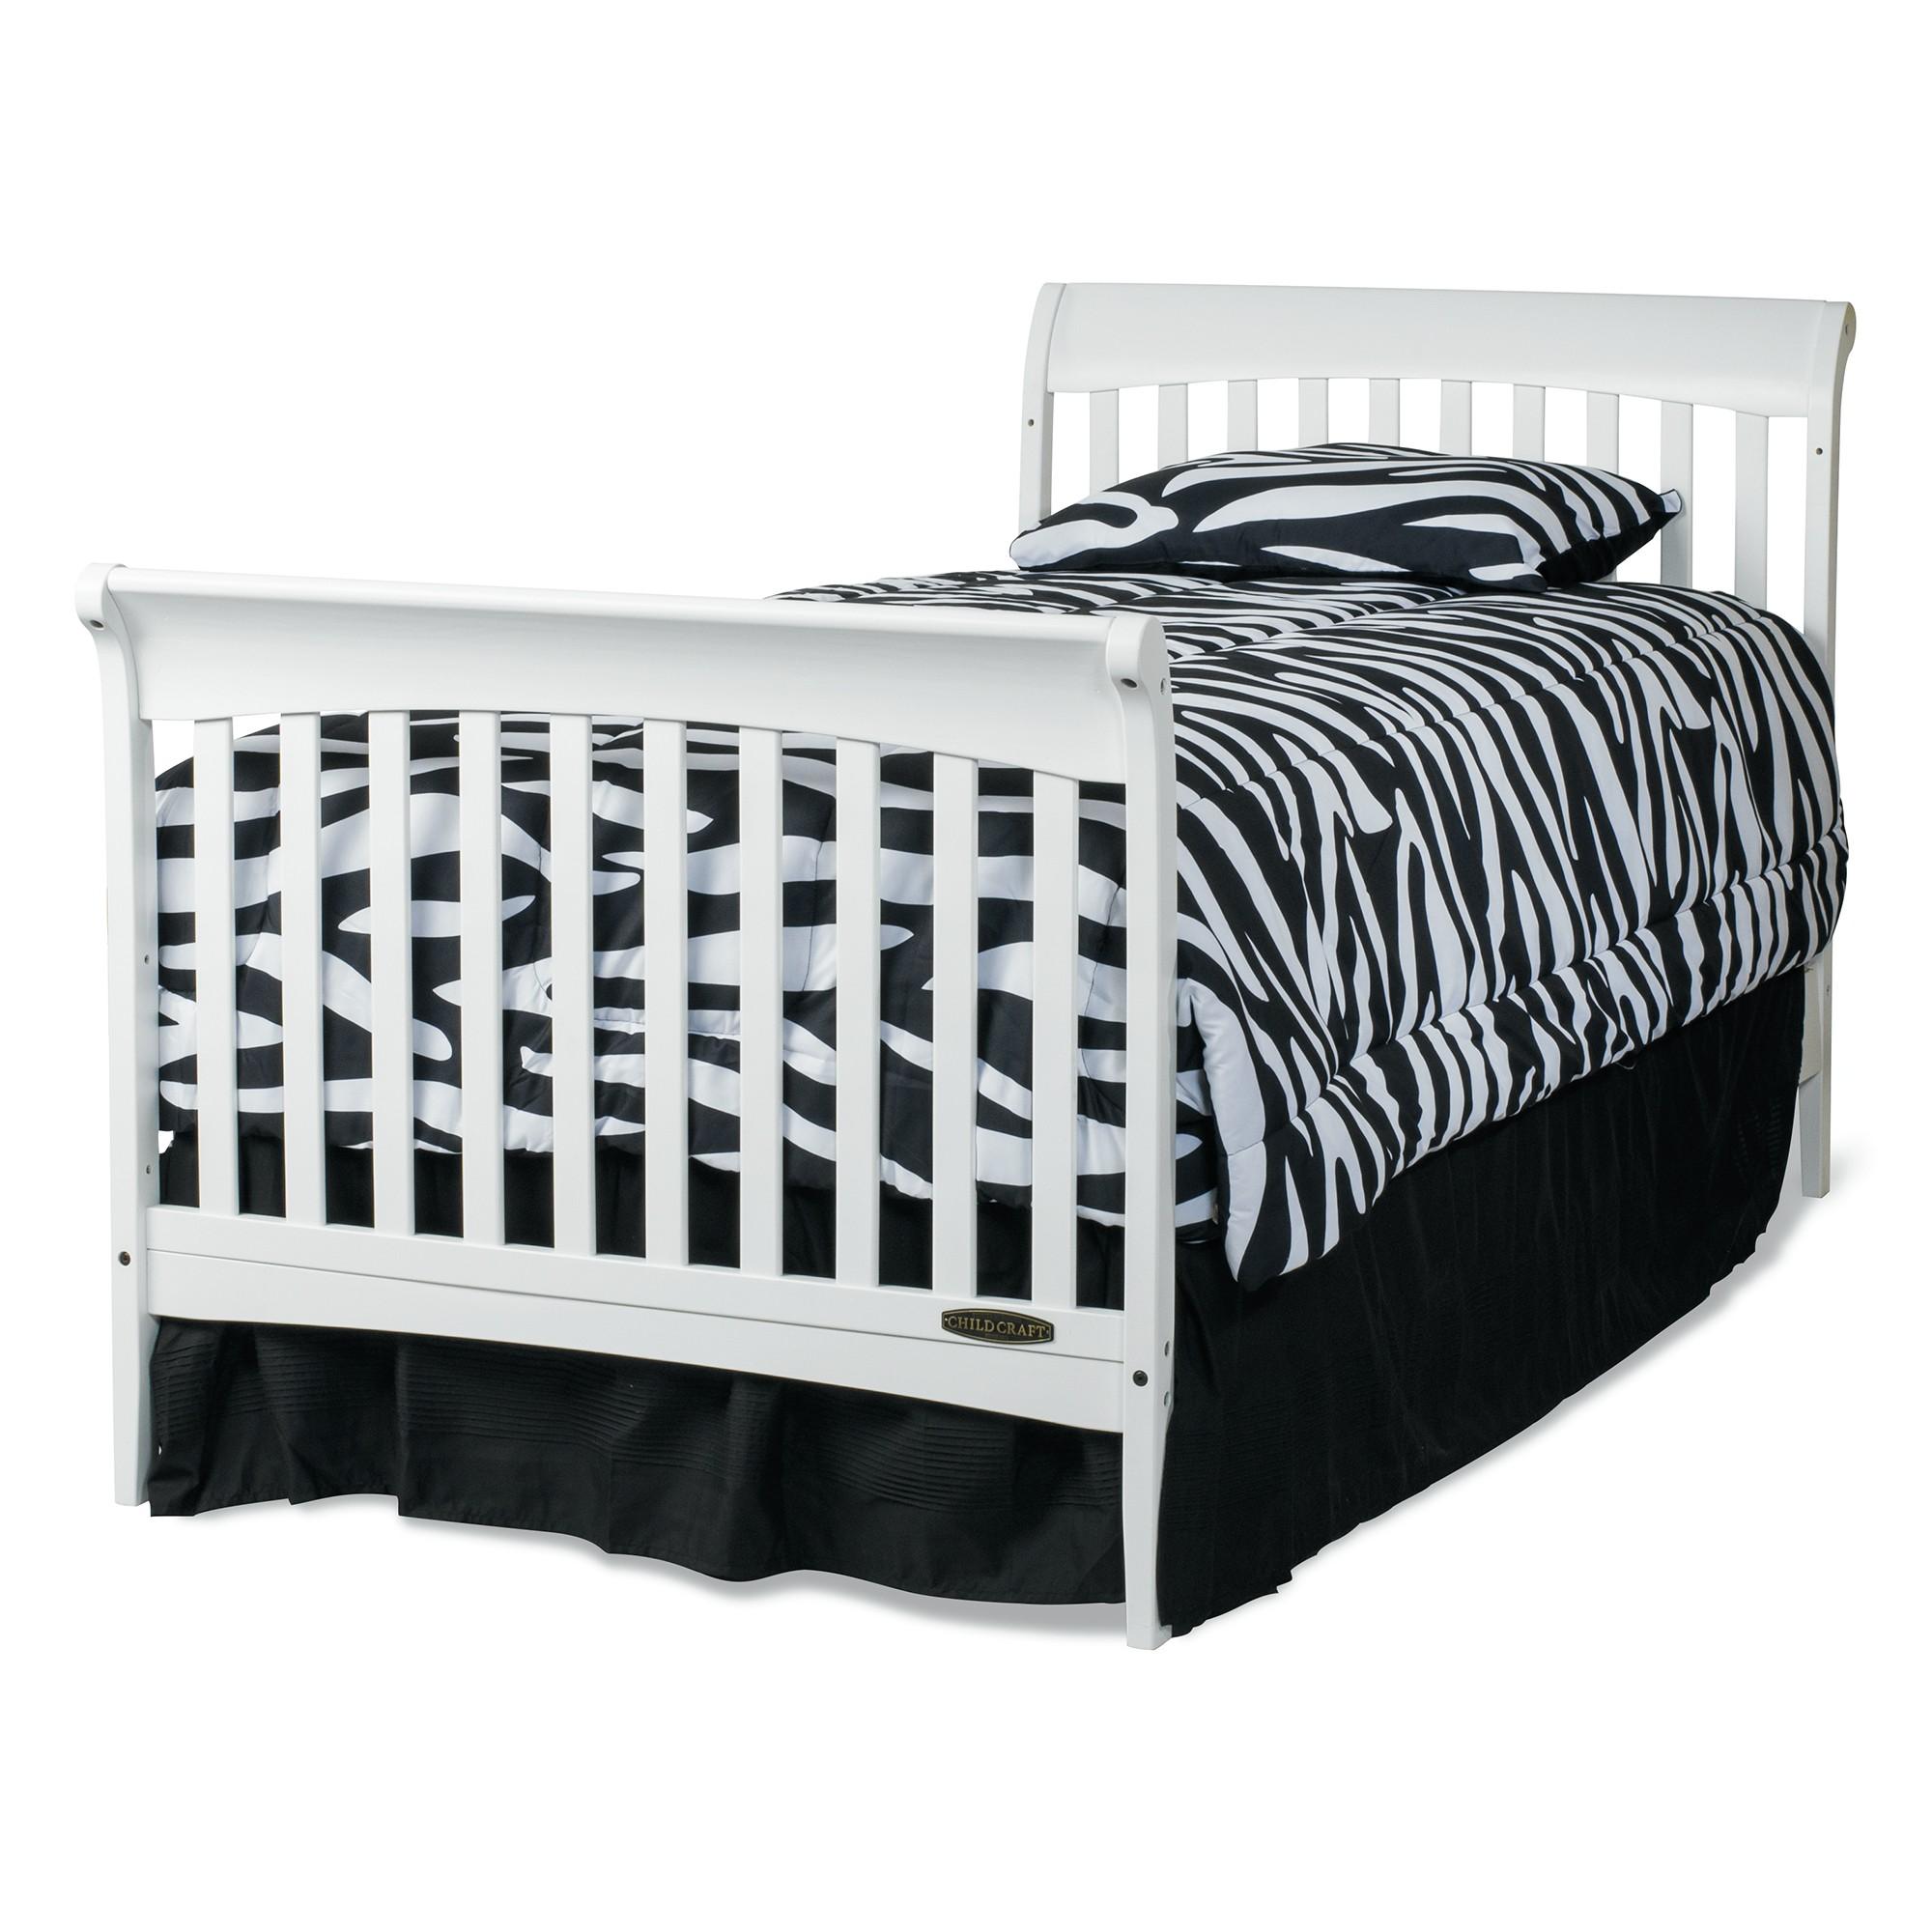 Child craft coventry crib -  Coventry Mini Convertible Child Craft Crib Full Bed Matte White Download